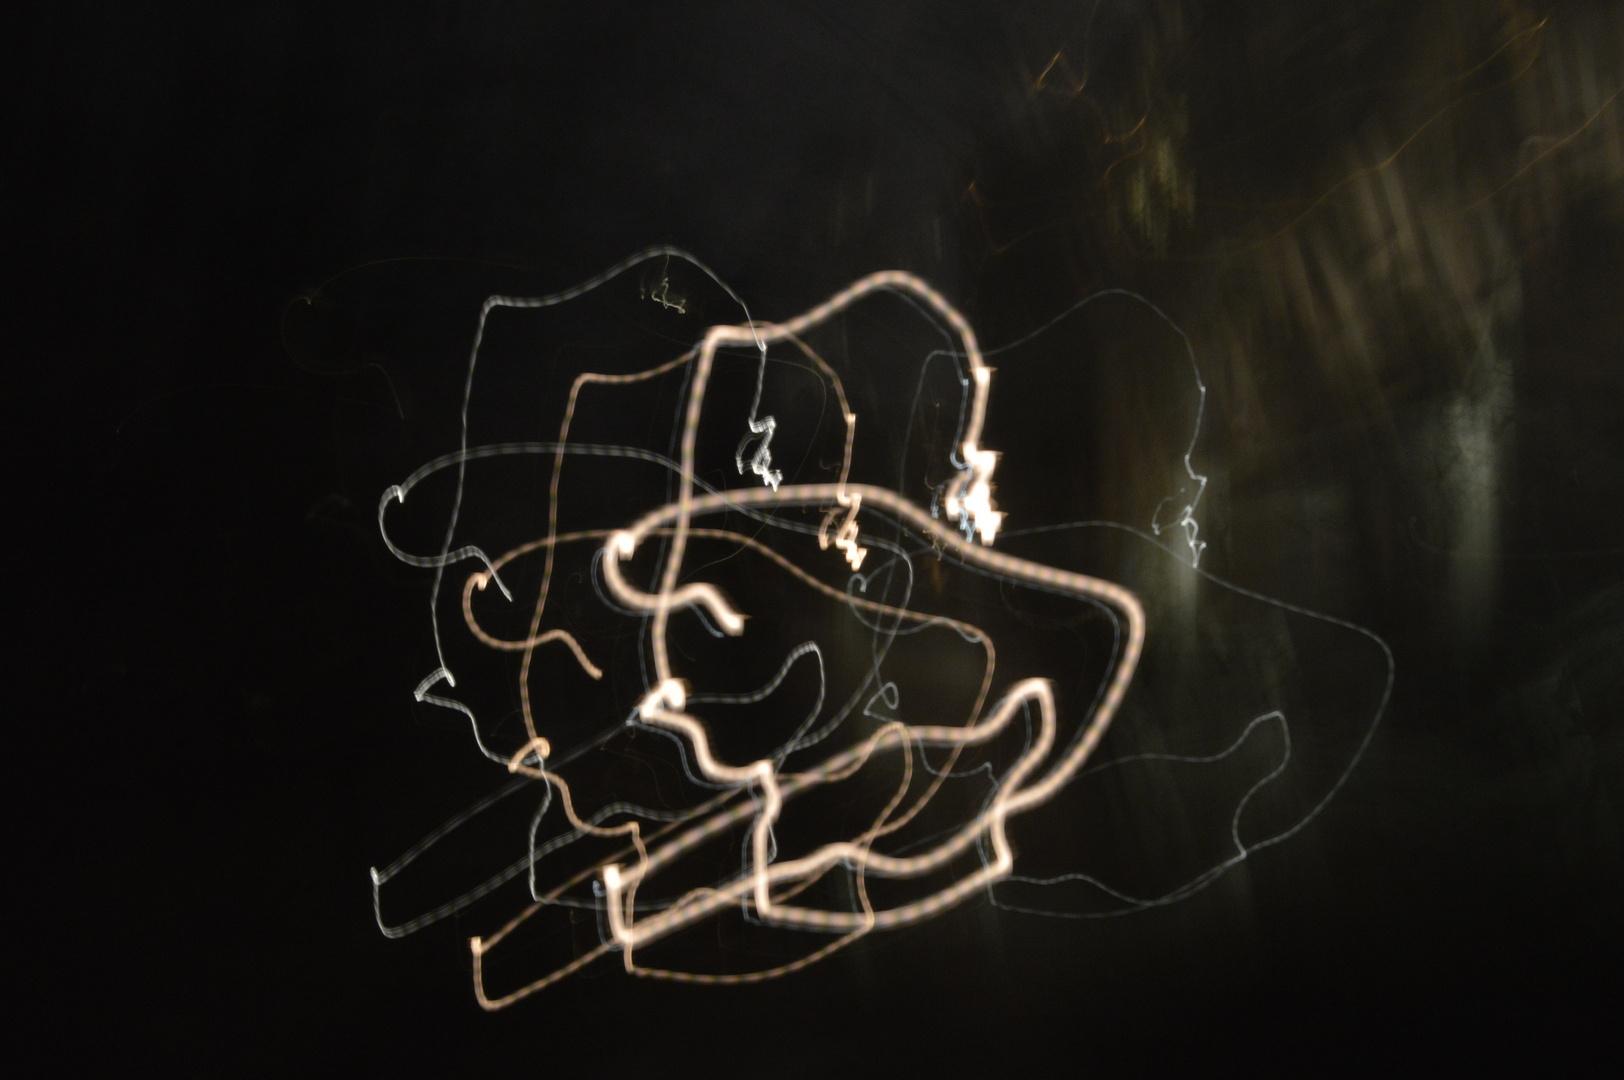 Lightpainting neben der Spur